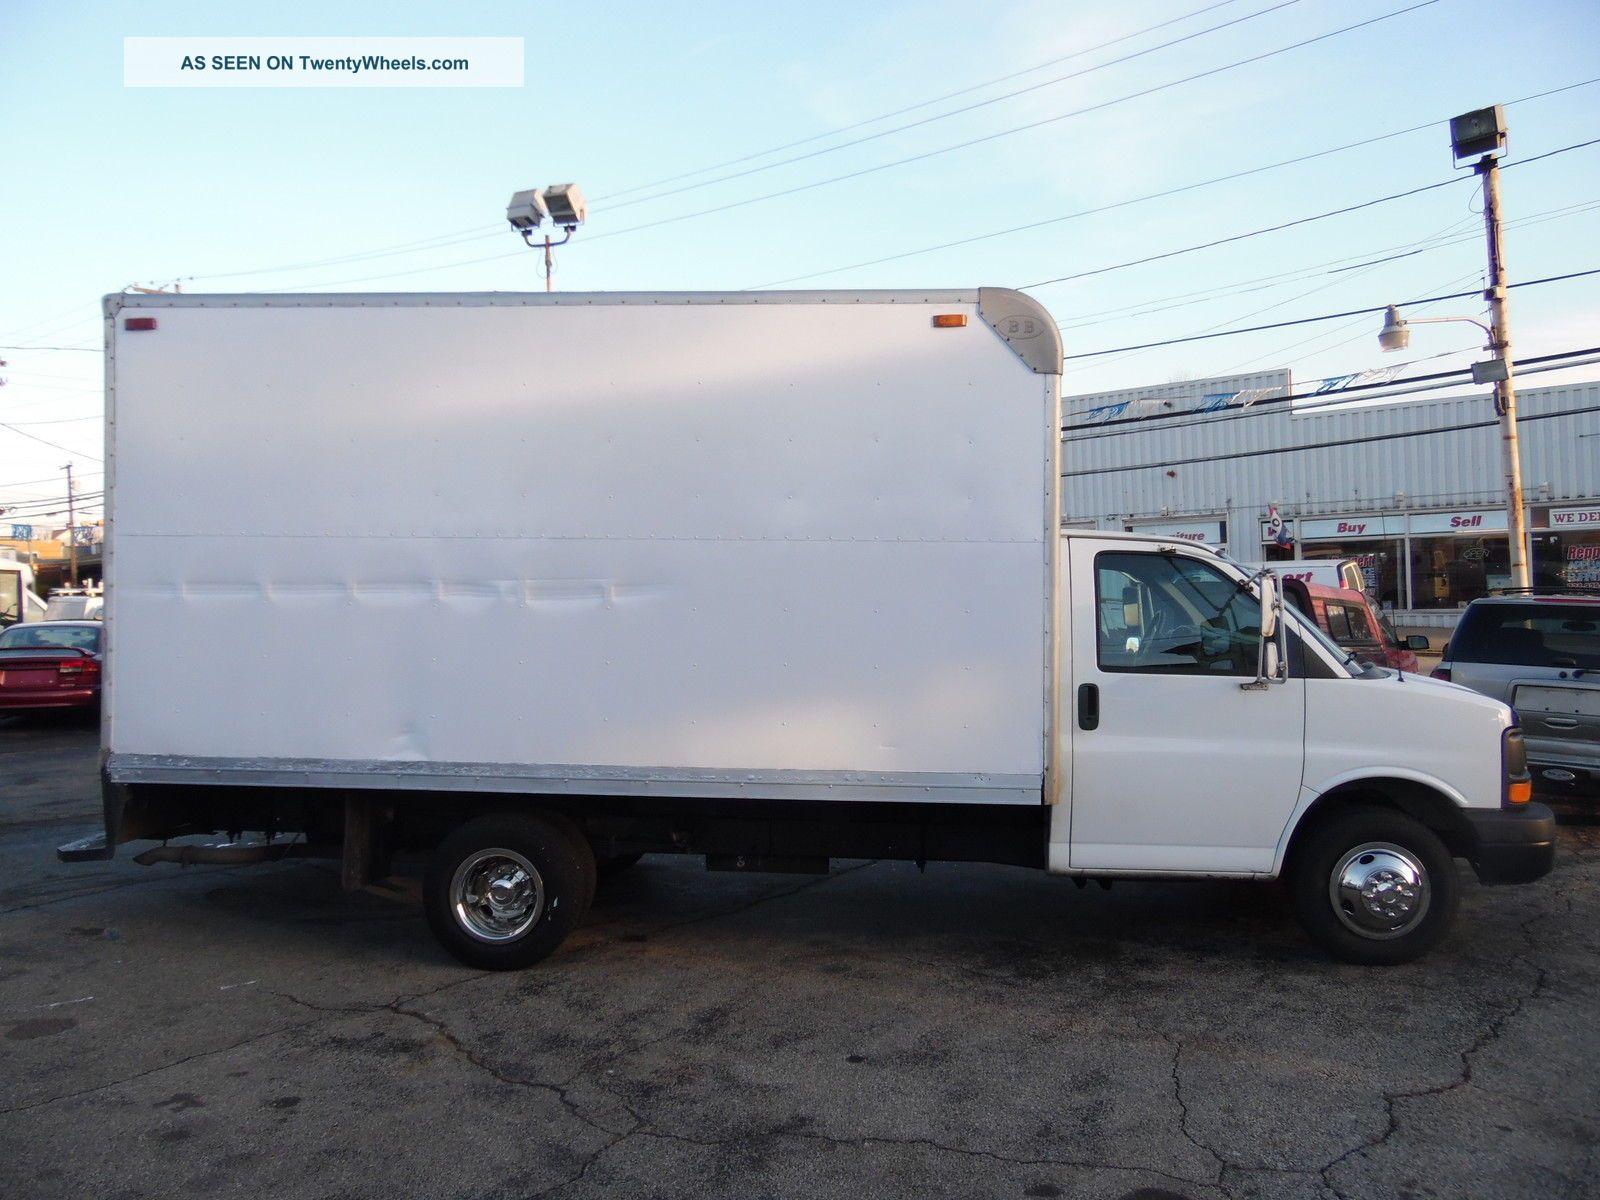 2005 Gmc 3500 Express Savana Delivery Van 16 Foot Box Truck